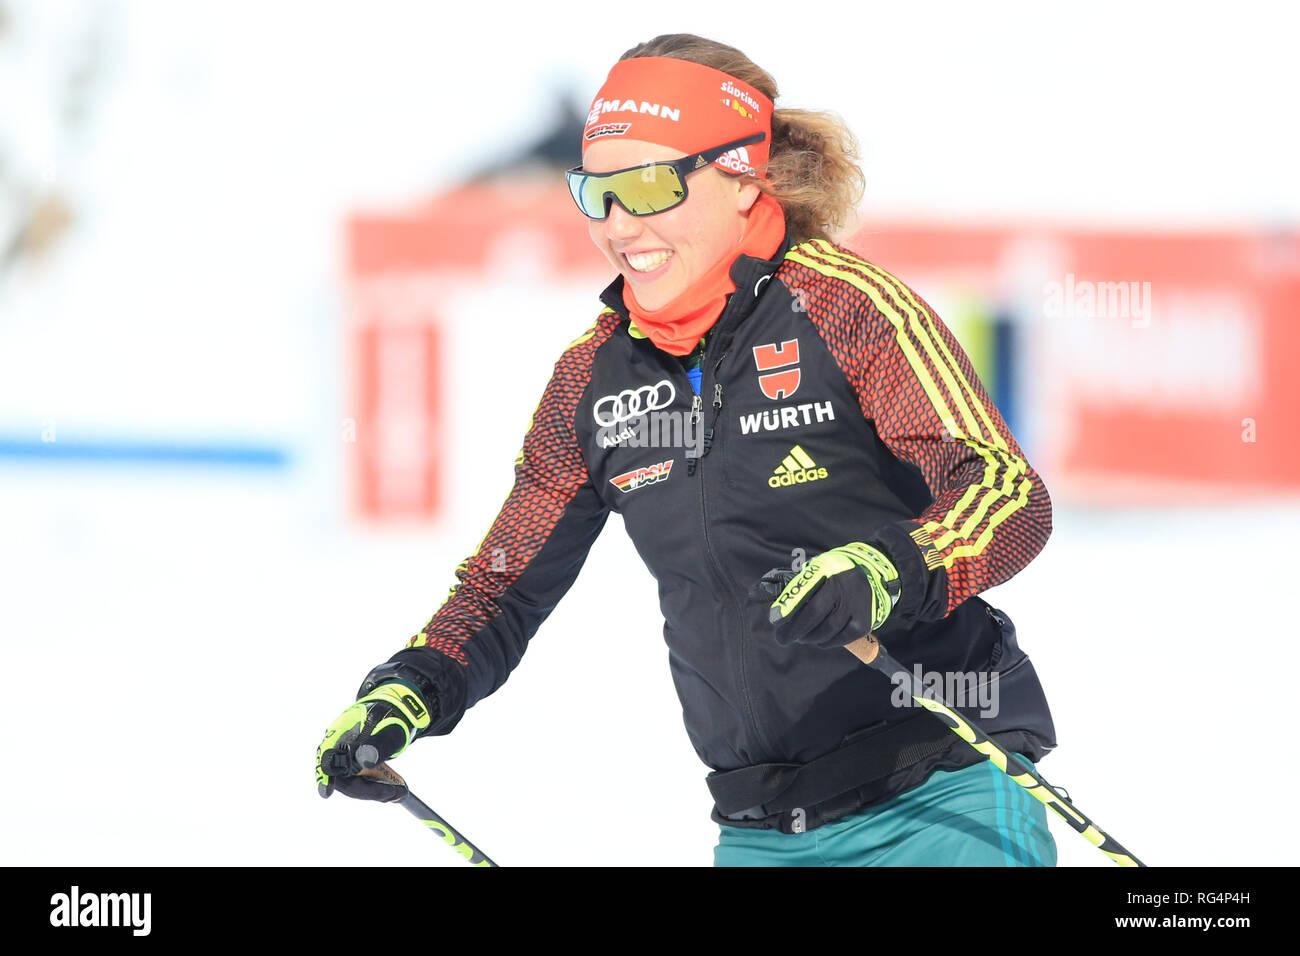 Antholz Antholz, Italien. 27 Jan, 2019. BMW Biathlon Weltcup, massenstart Frauen; Laura Dahlmeier (GER) Credit: Aktion plus Sport/Alamy leben Nachrichten Stockbild